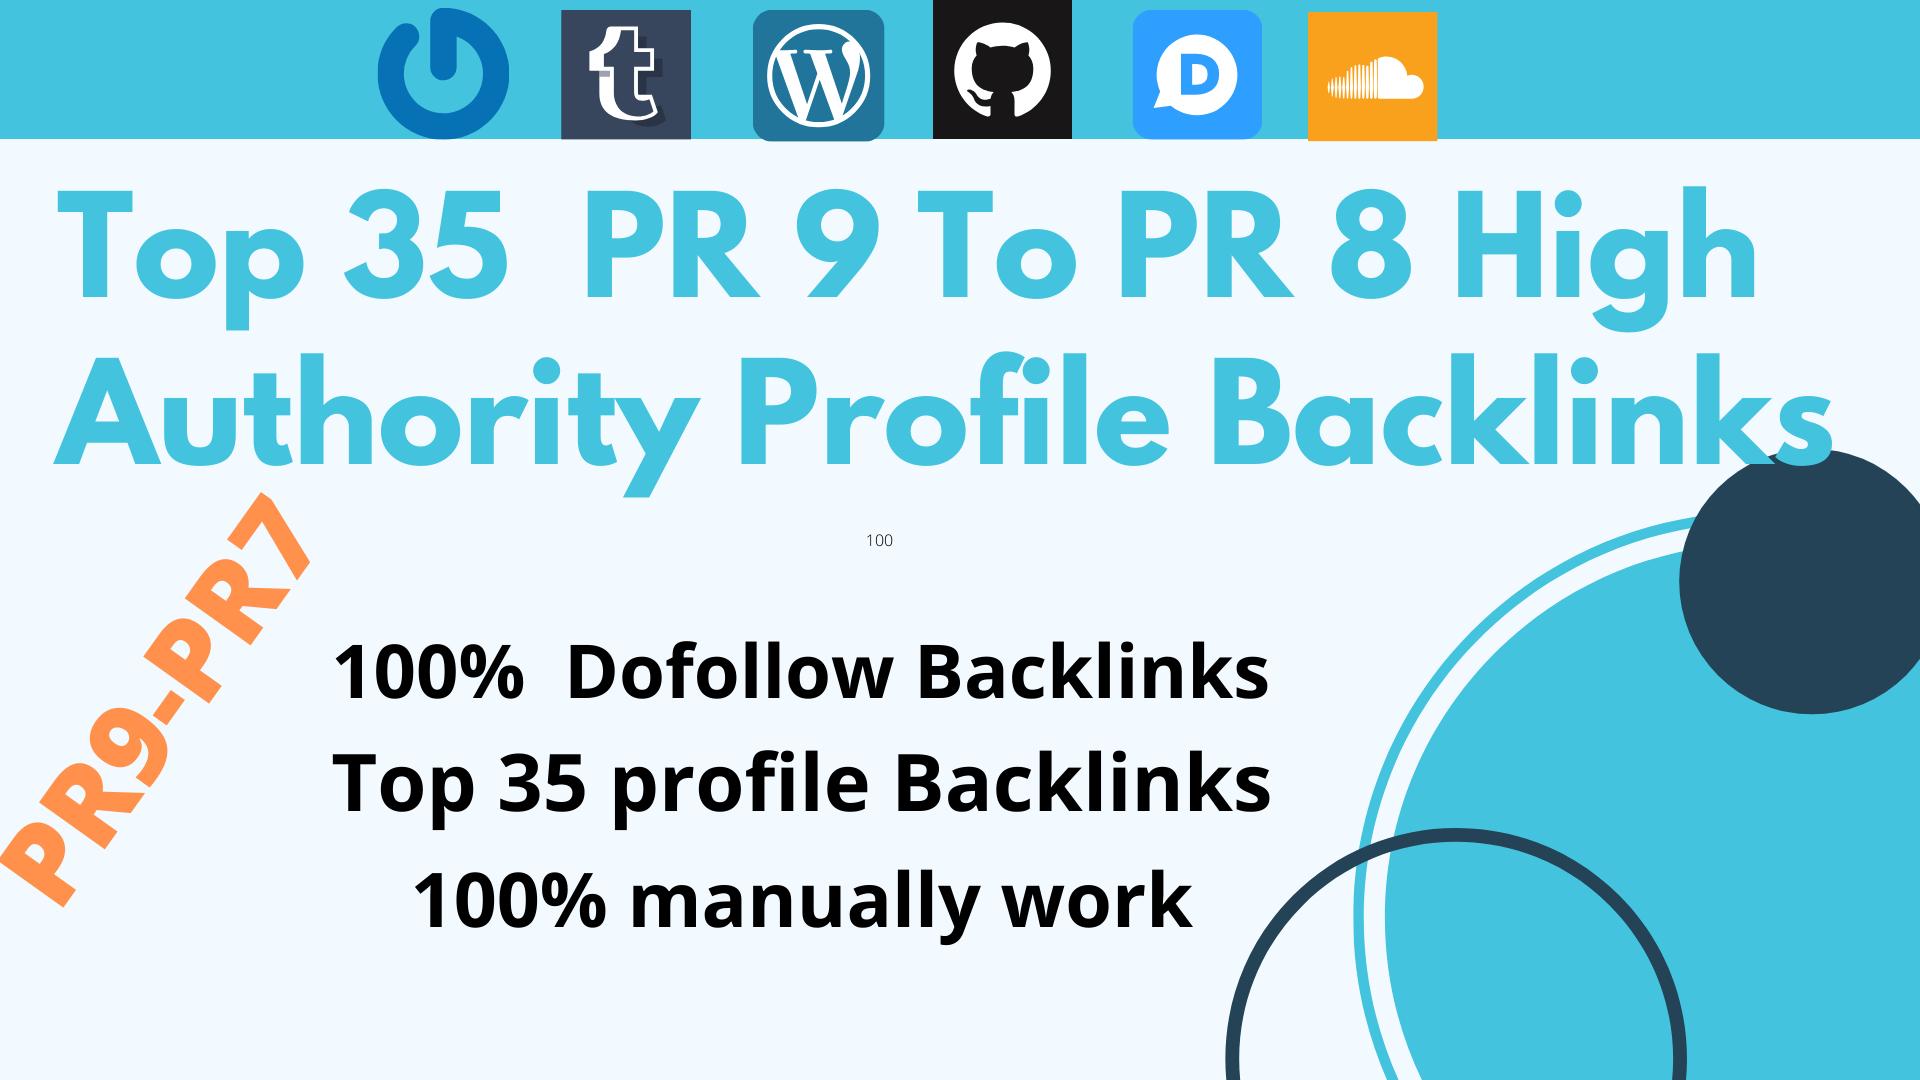 Give you Top 35 high authority do-follow PR9-PR7 profile backlinks